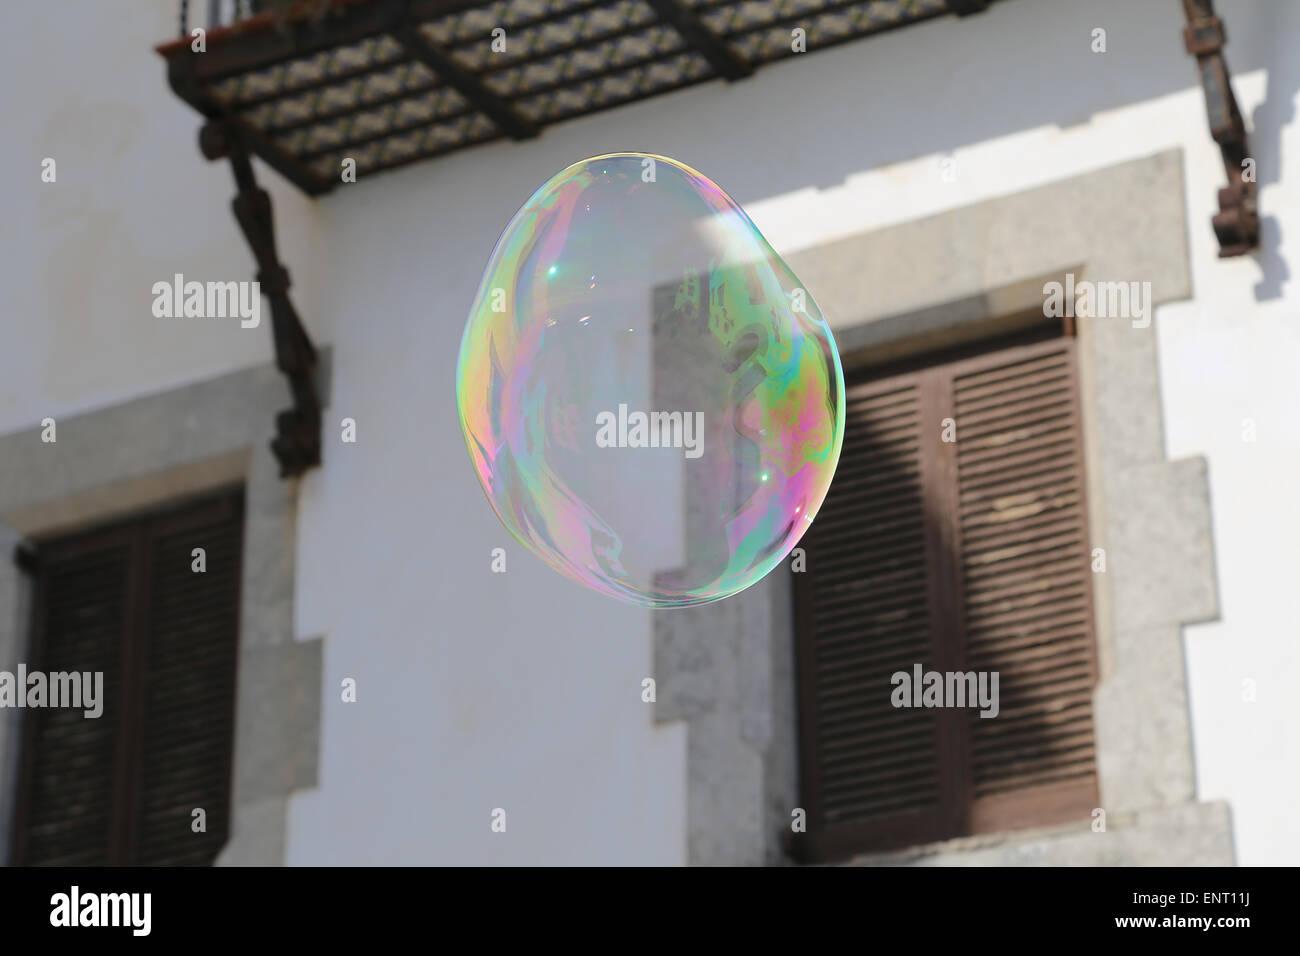 Burbuja de jabón. Imagen De Stock